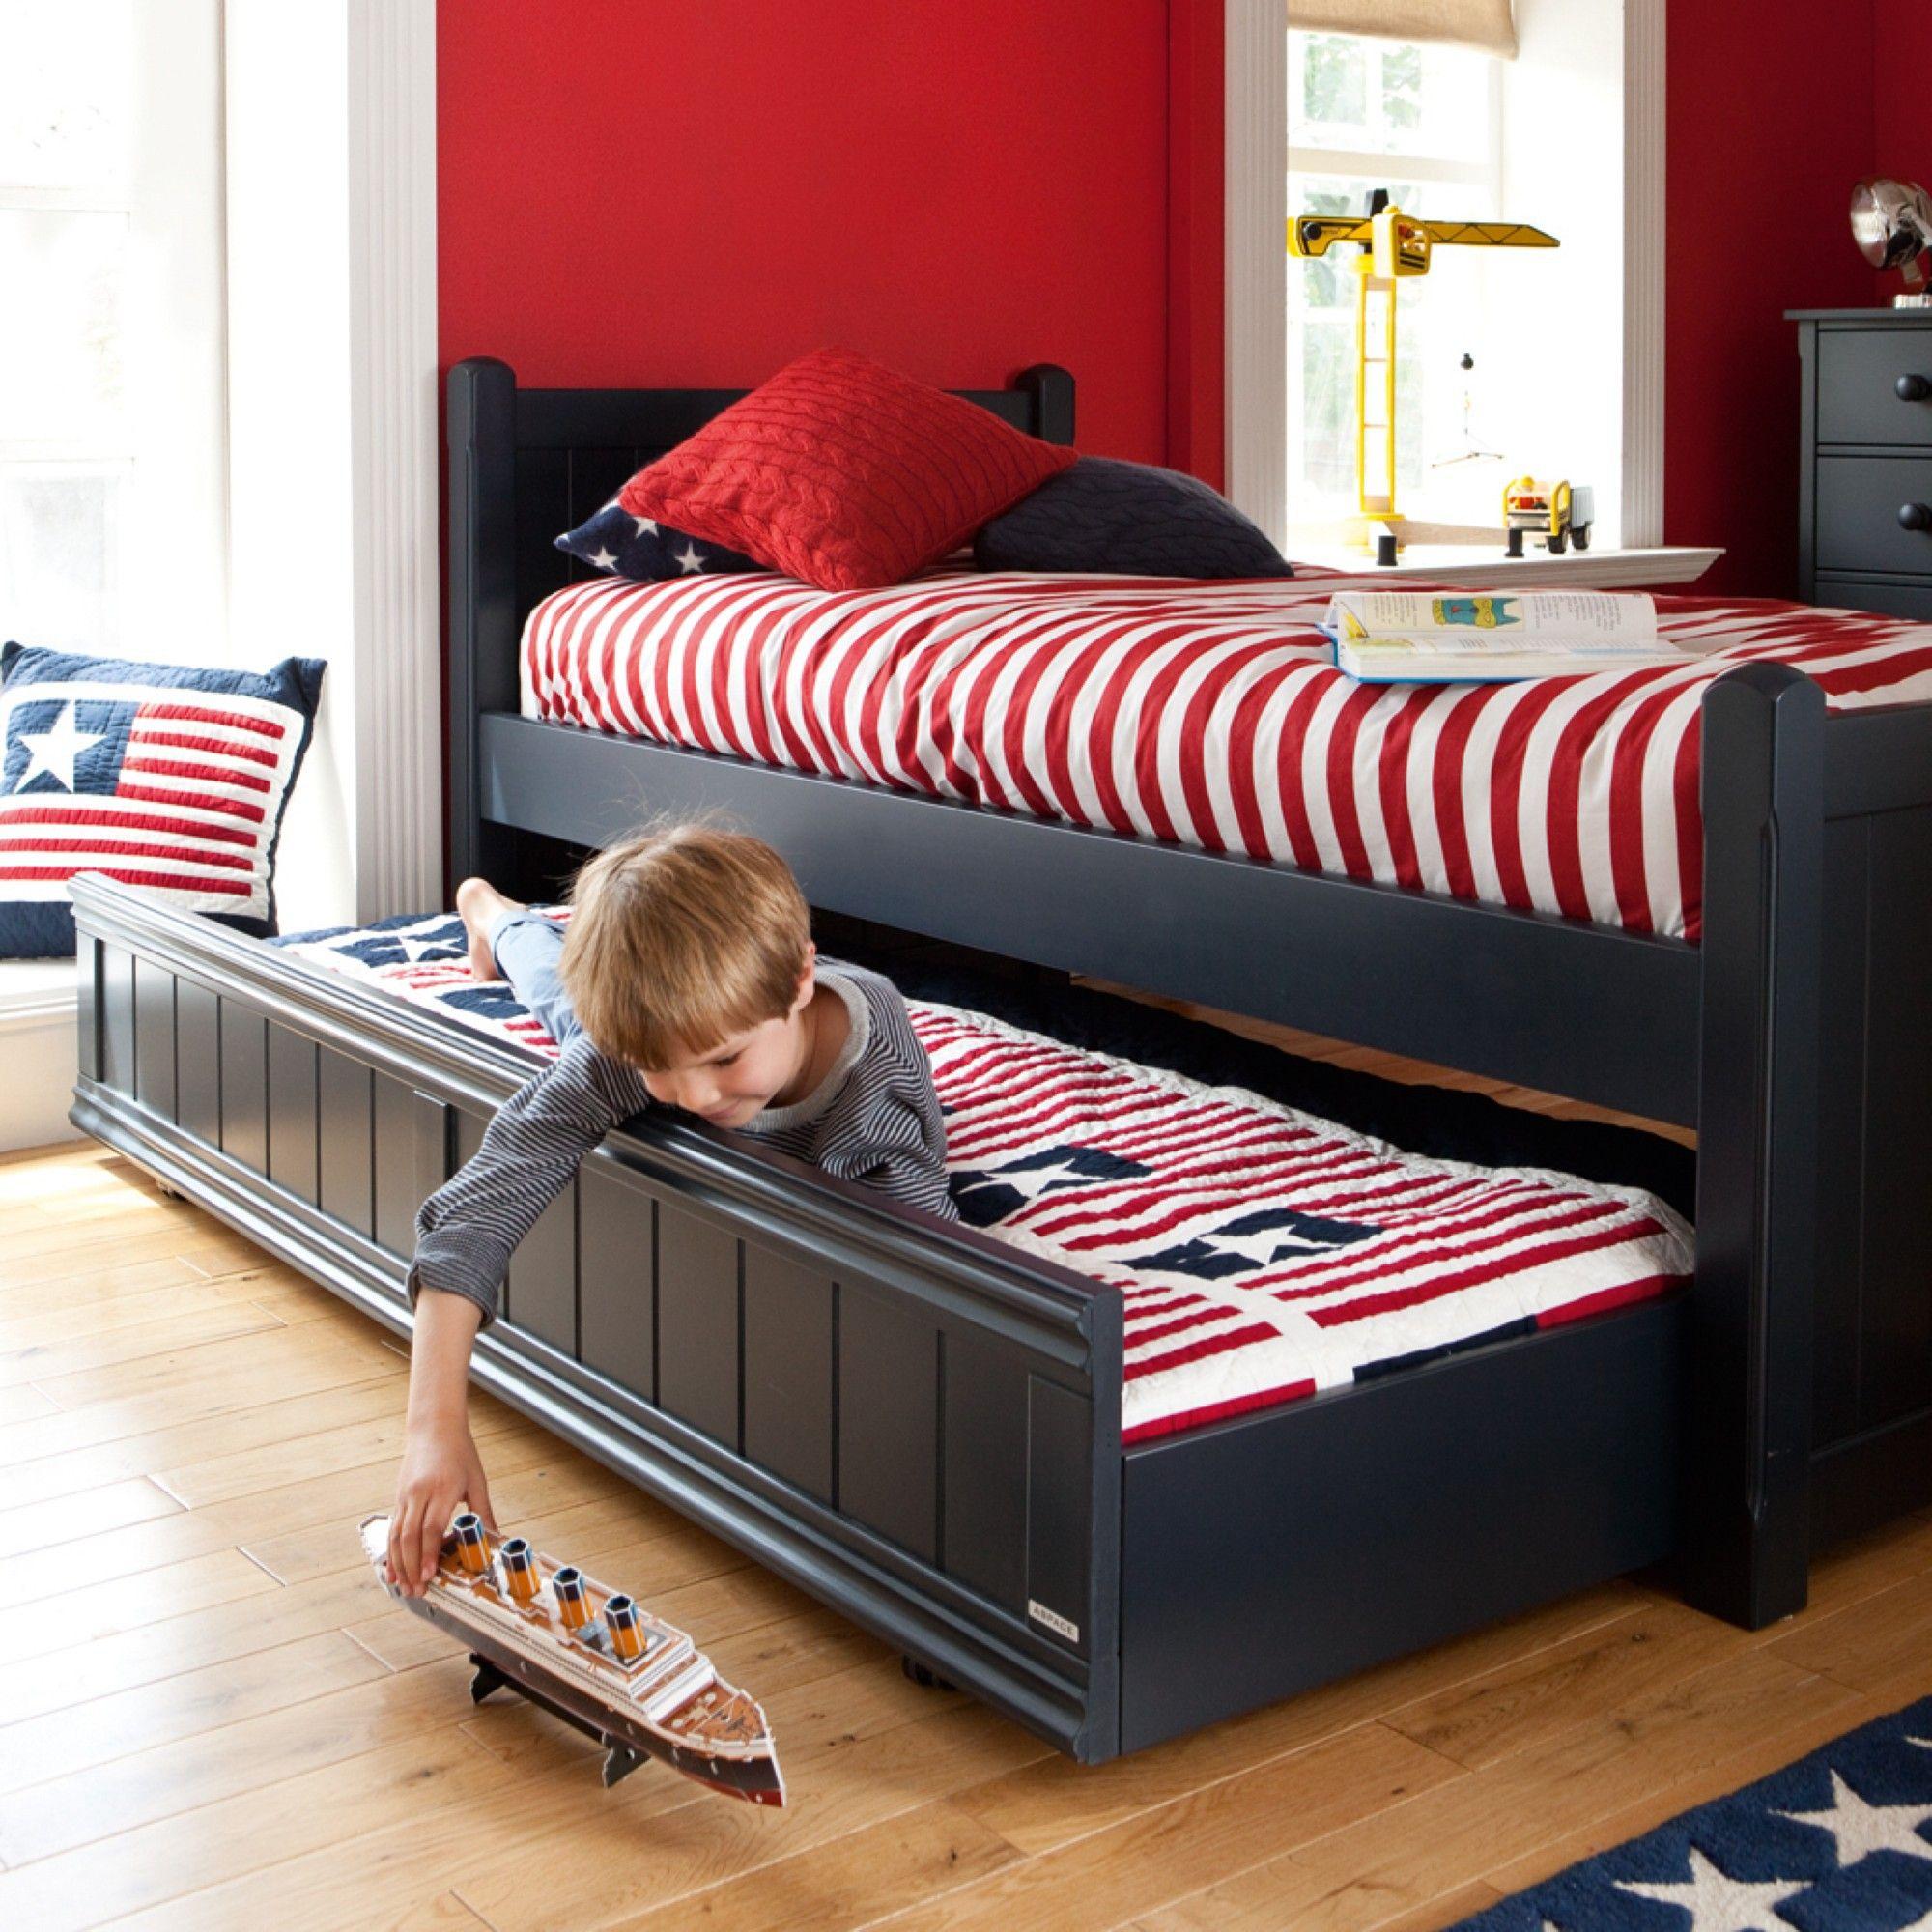 Charterhouse Sleepover Bed Prussian Blue Sleepover Beds Childrens Bedroom Furniture Sets Childrens Single Beds